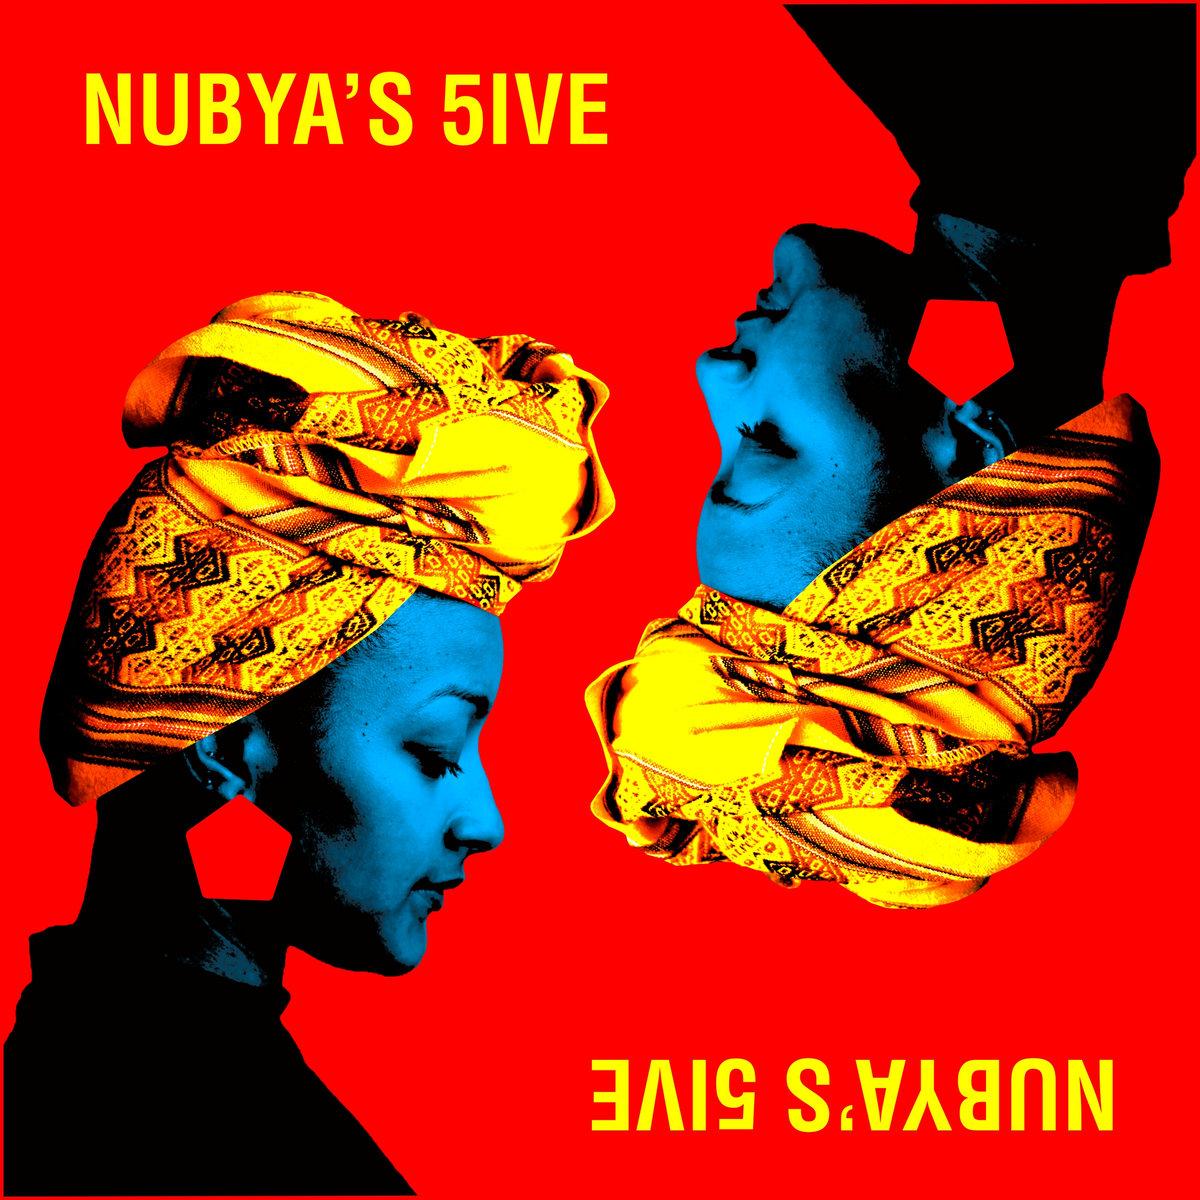 NUBYA GARCIA - 5IVES (JAZZ:REFRESHED, 2017)